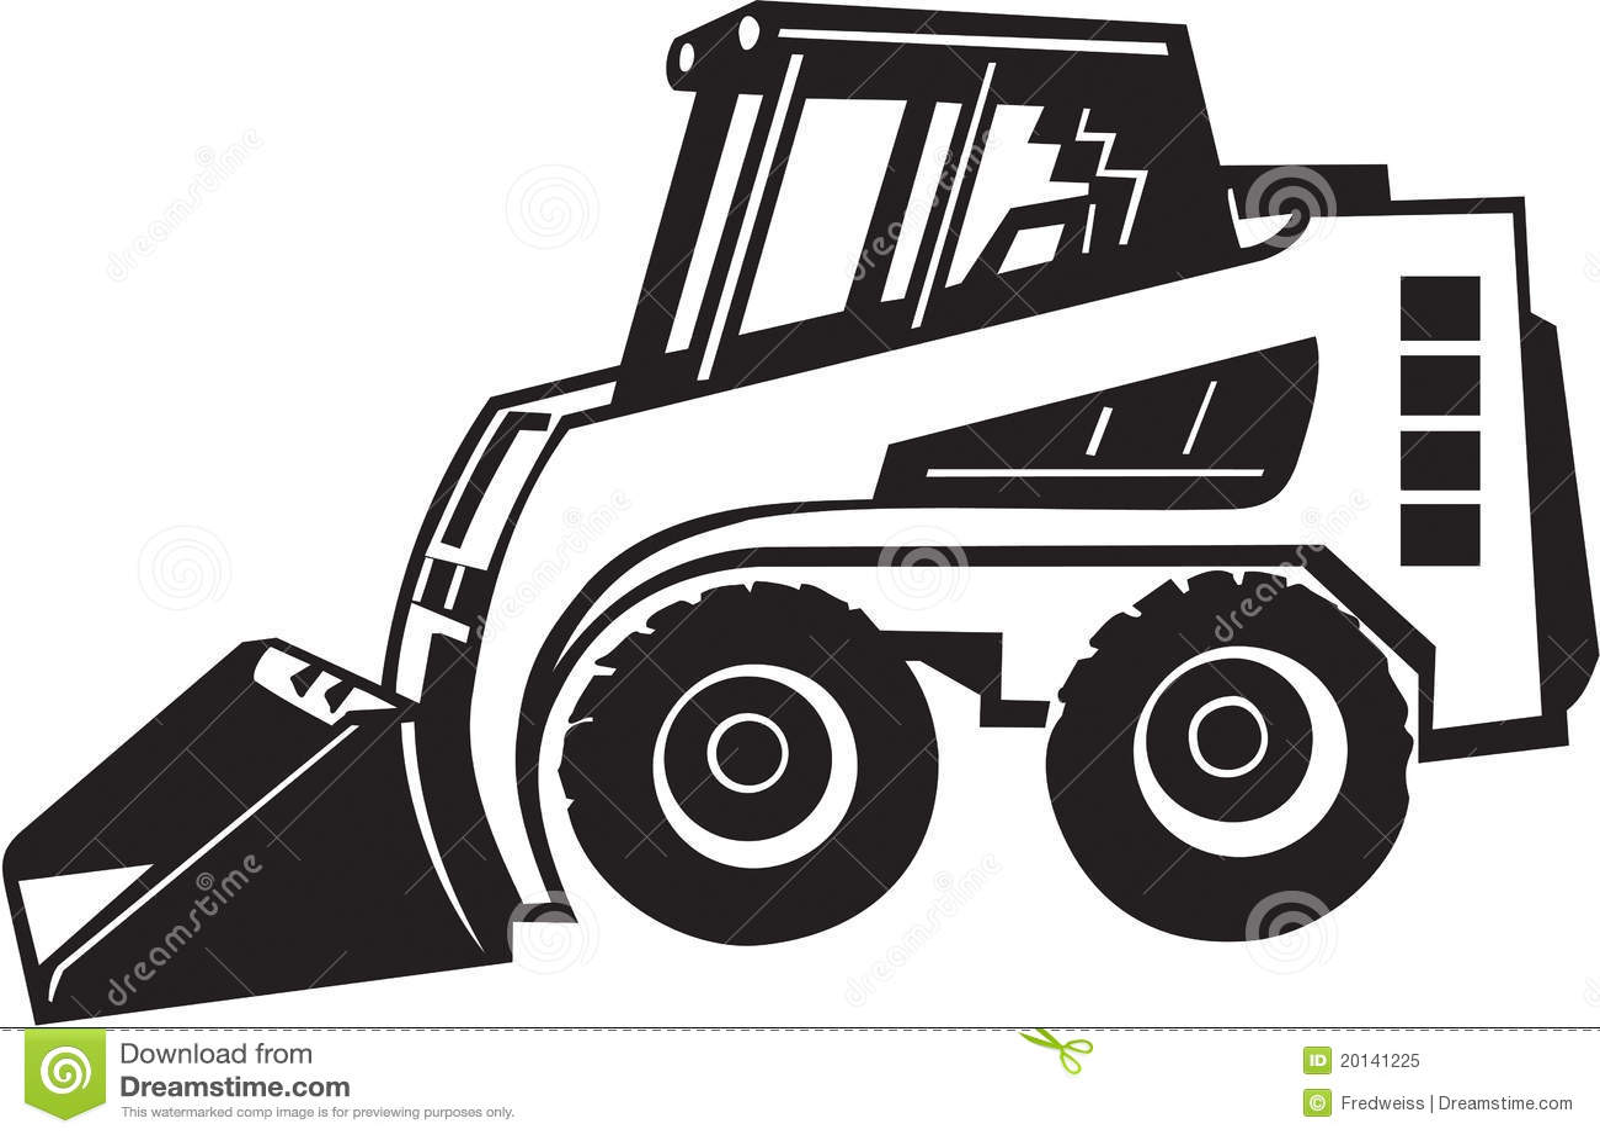 Front Loader Illustration Royalty Free Stock Photo - Image: 20141225